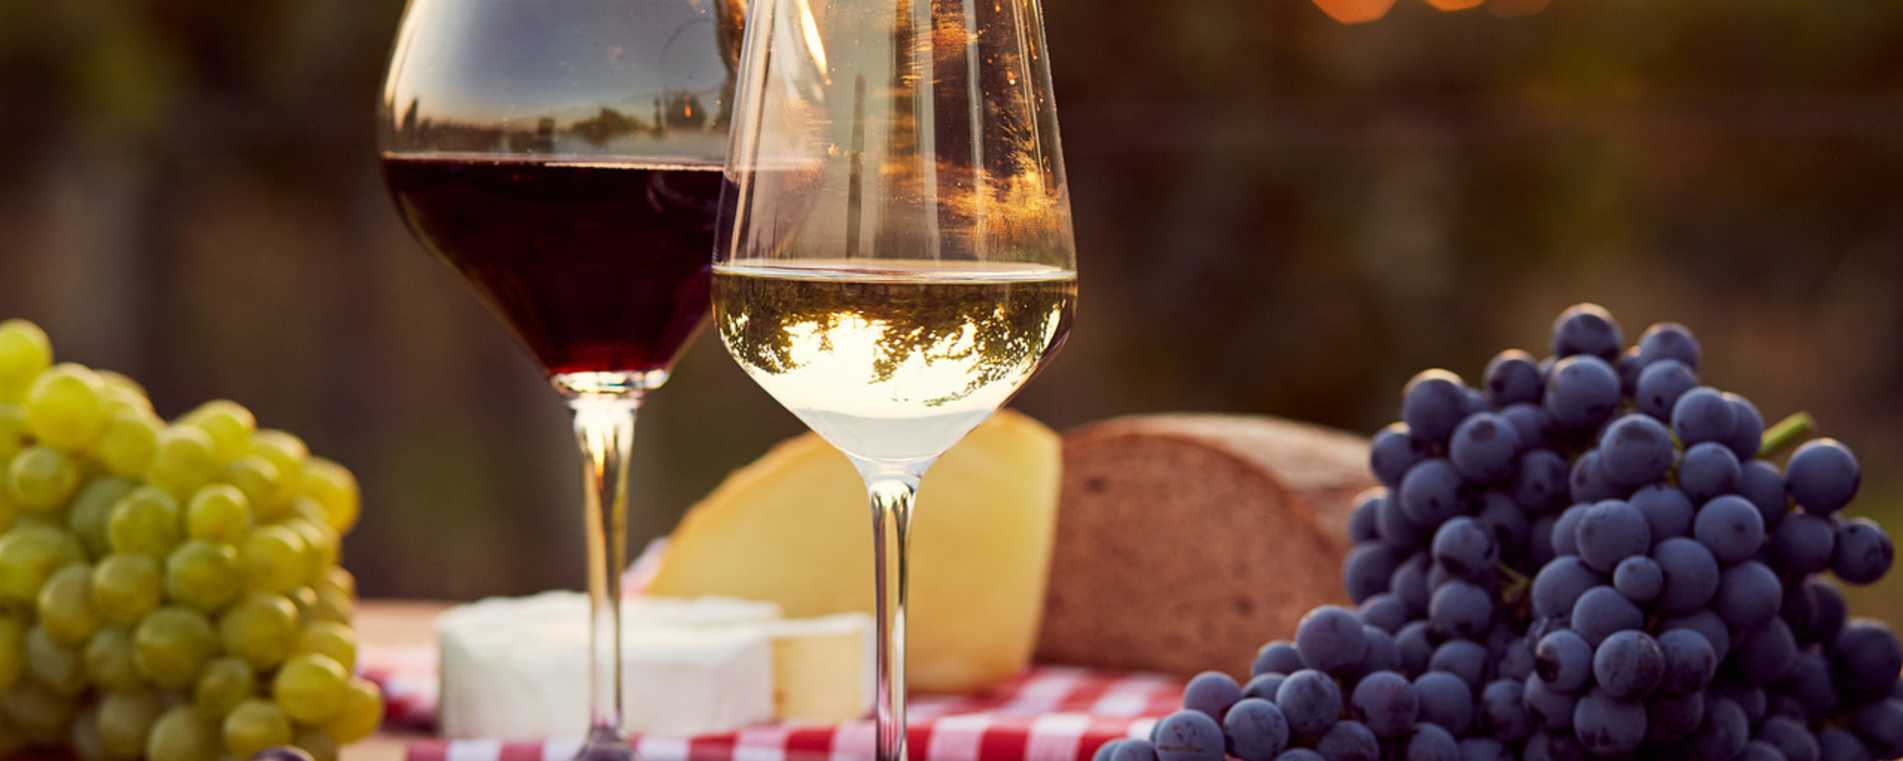 Wine - Destination Temecula Wine Tours and Experiences